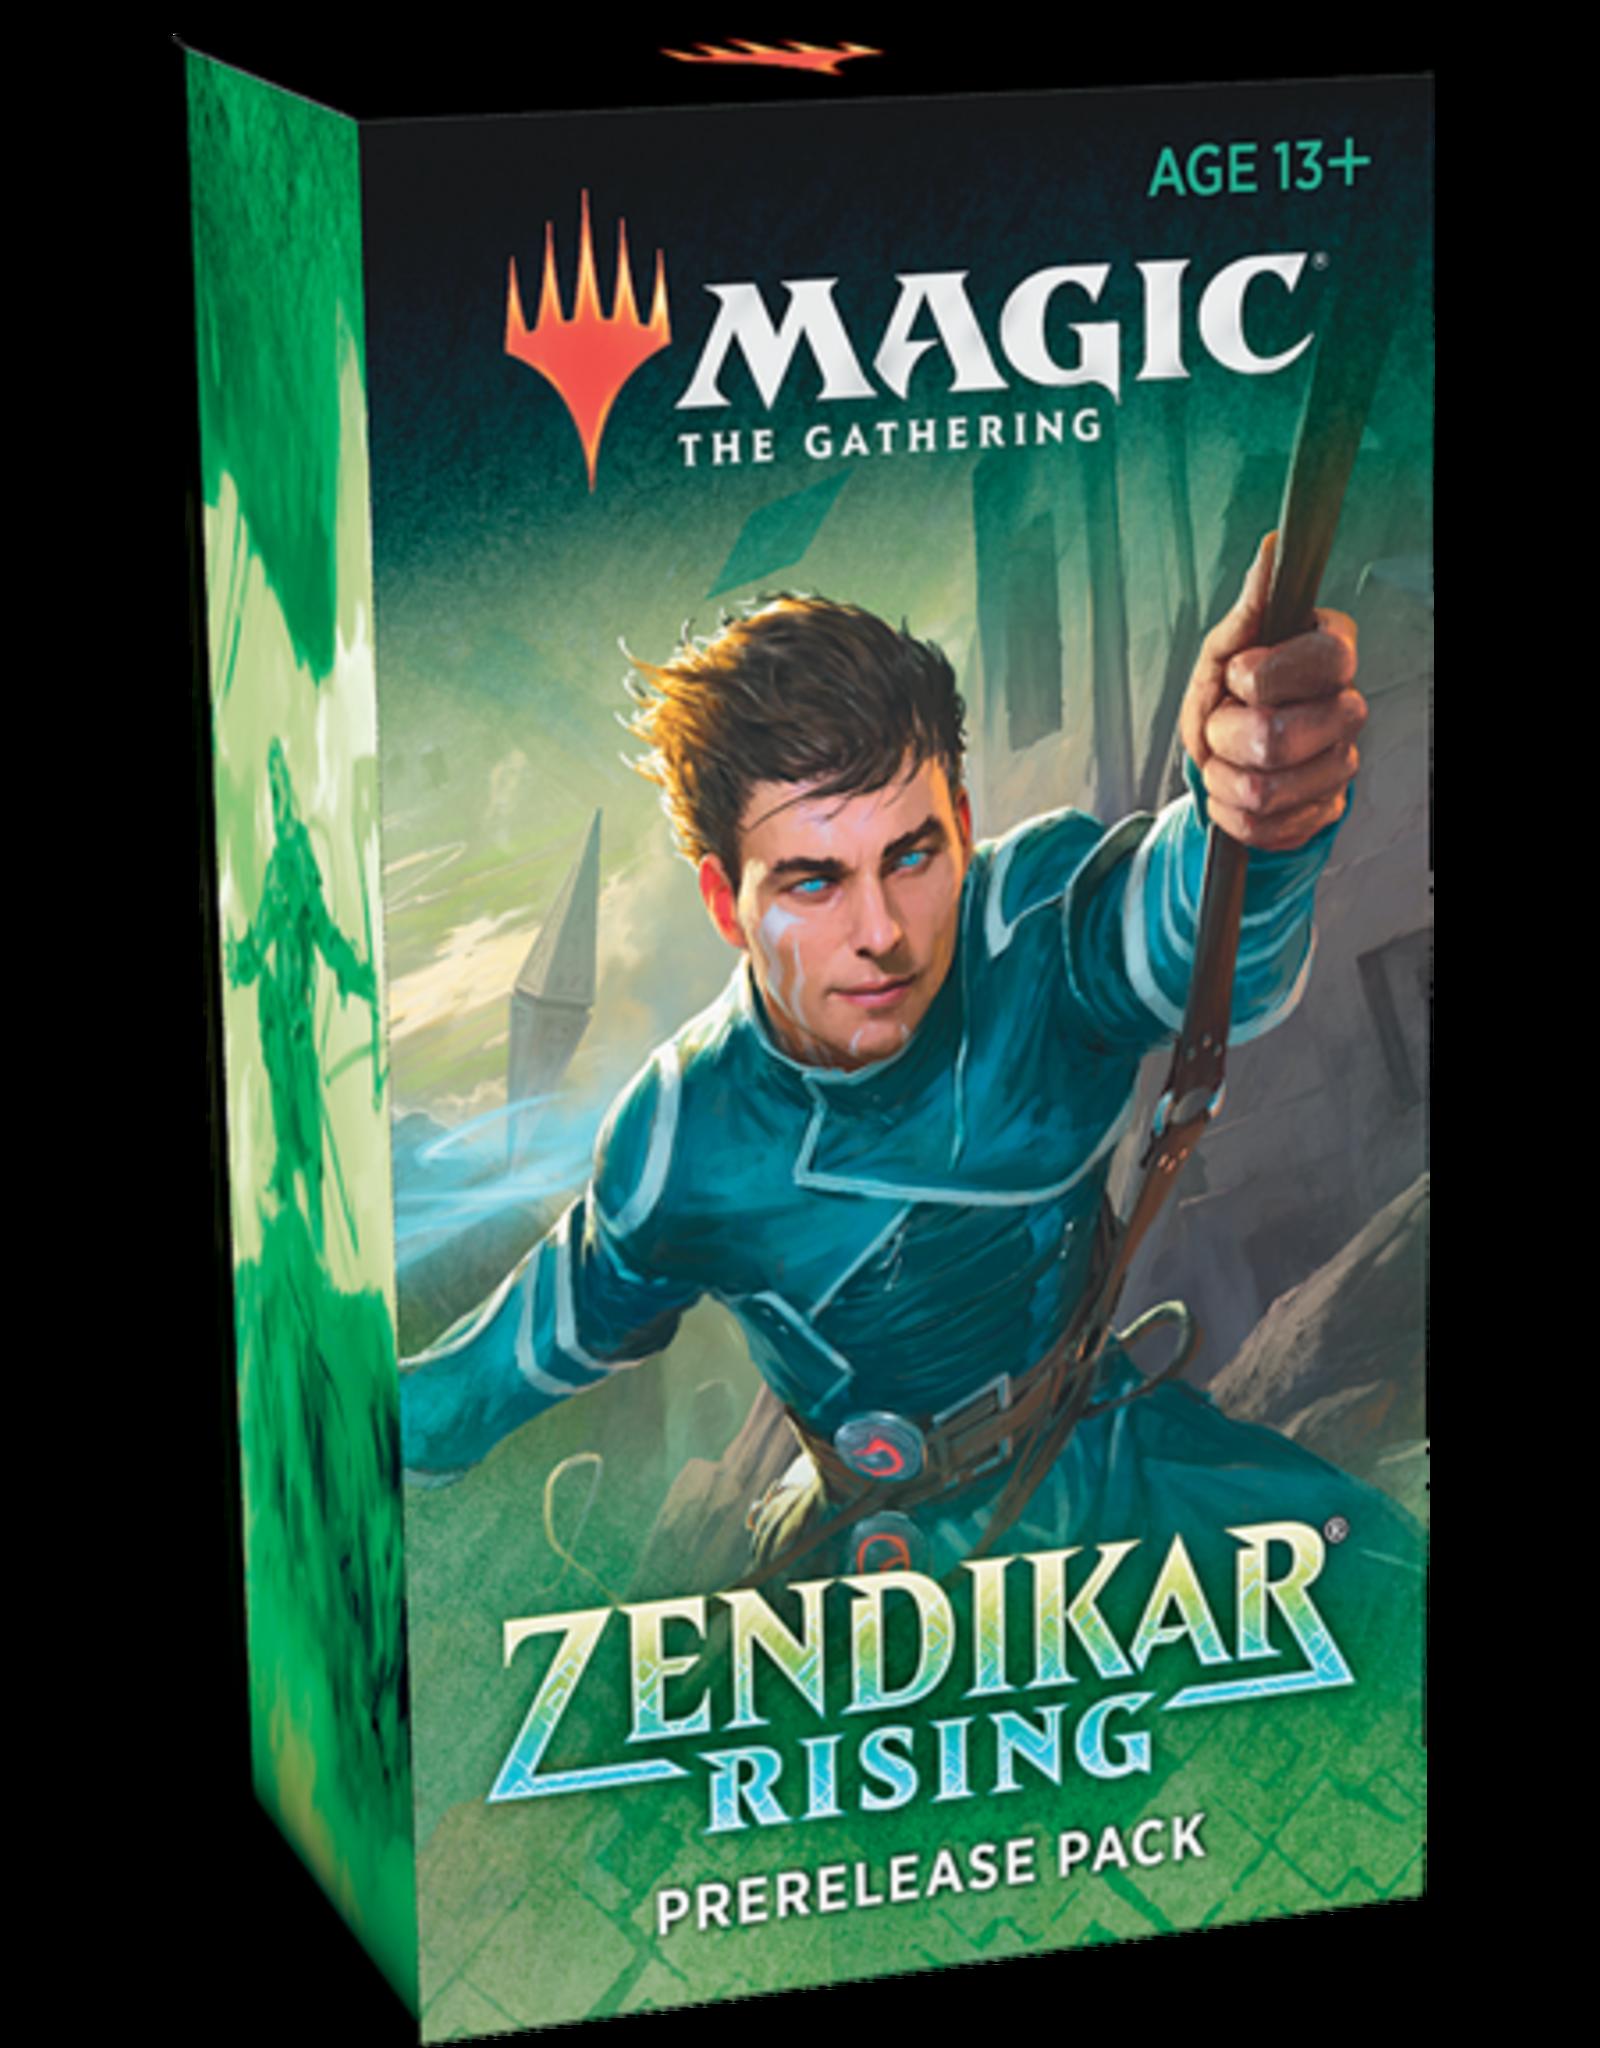 Wizards of the Coast MTG Zendikar Rising Pre-Release Pack